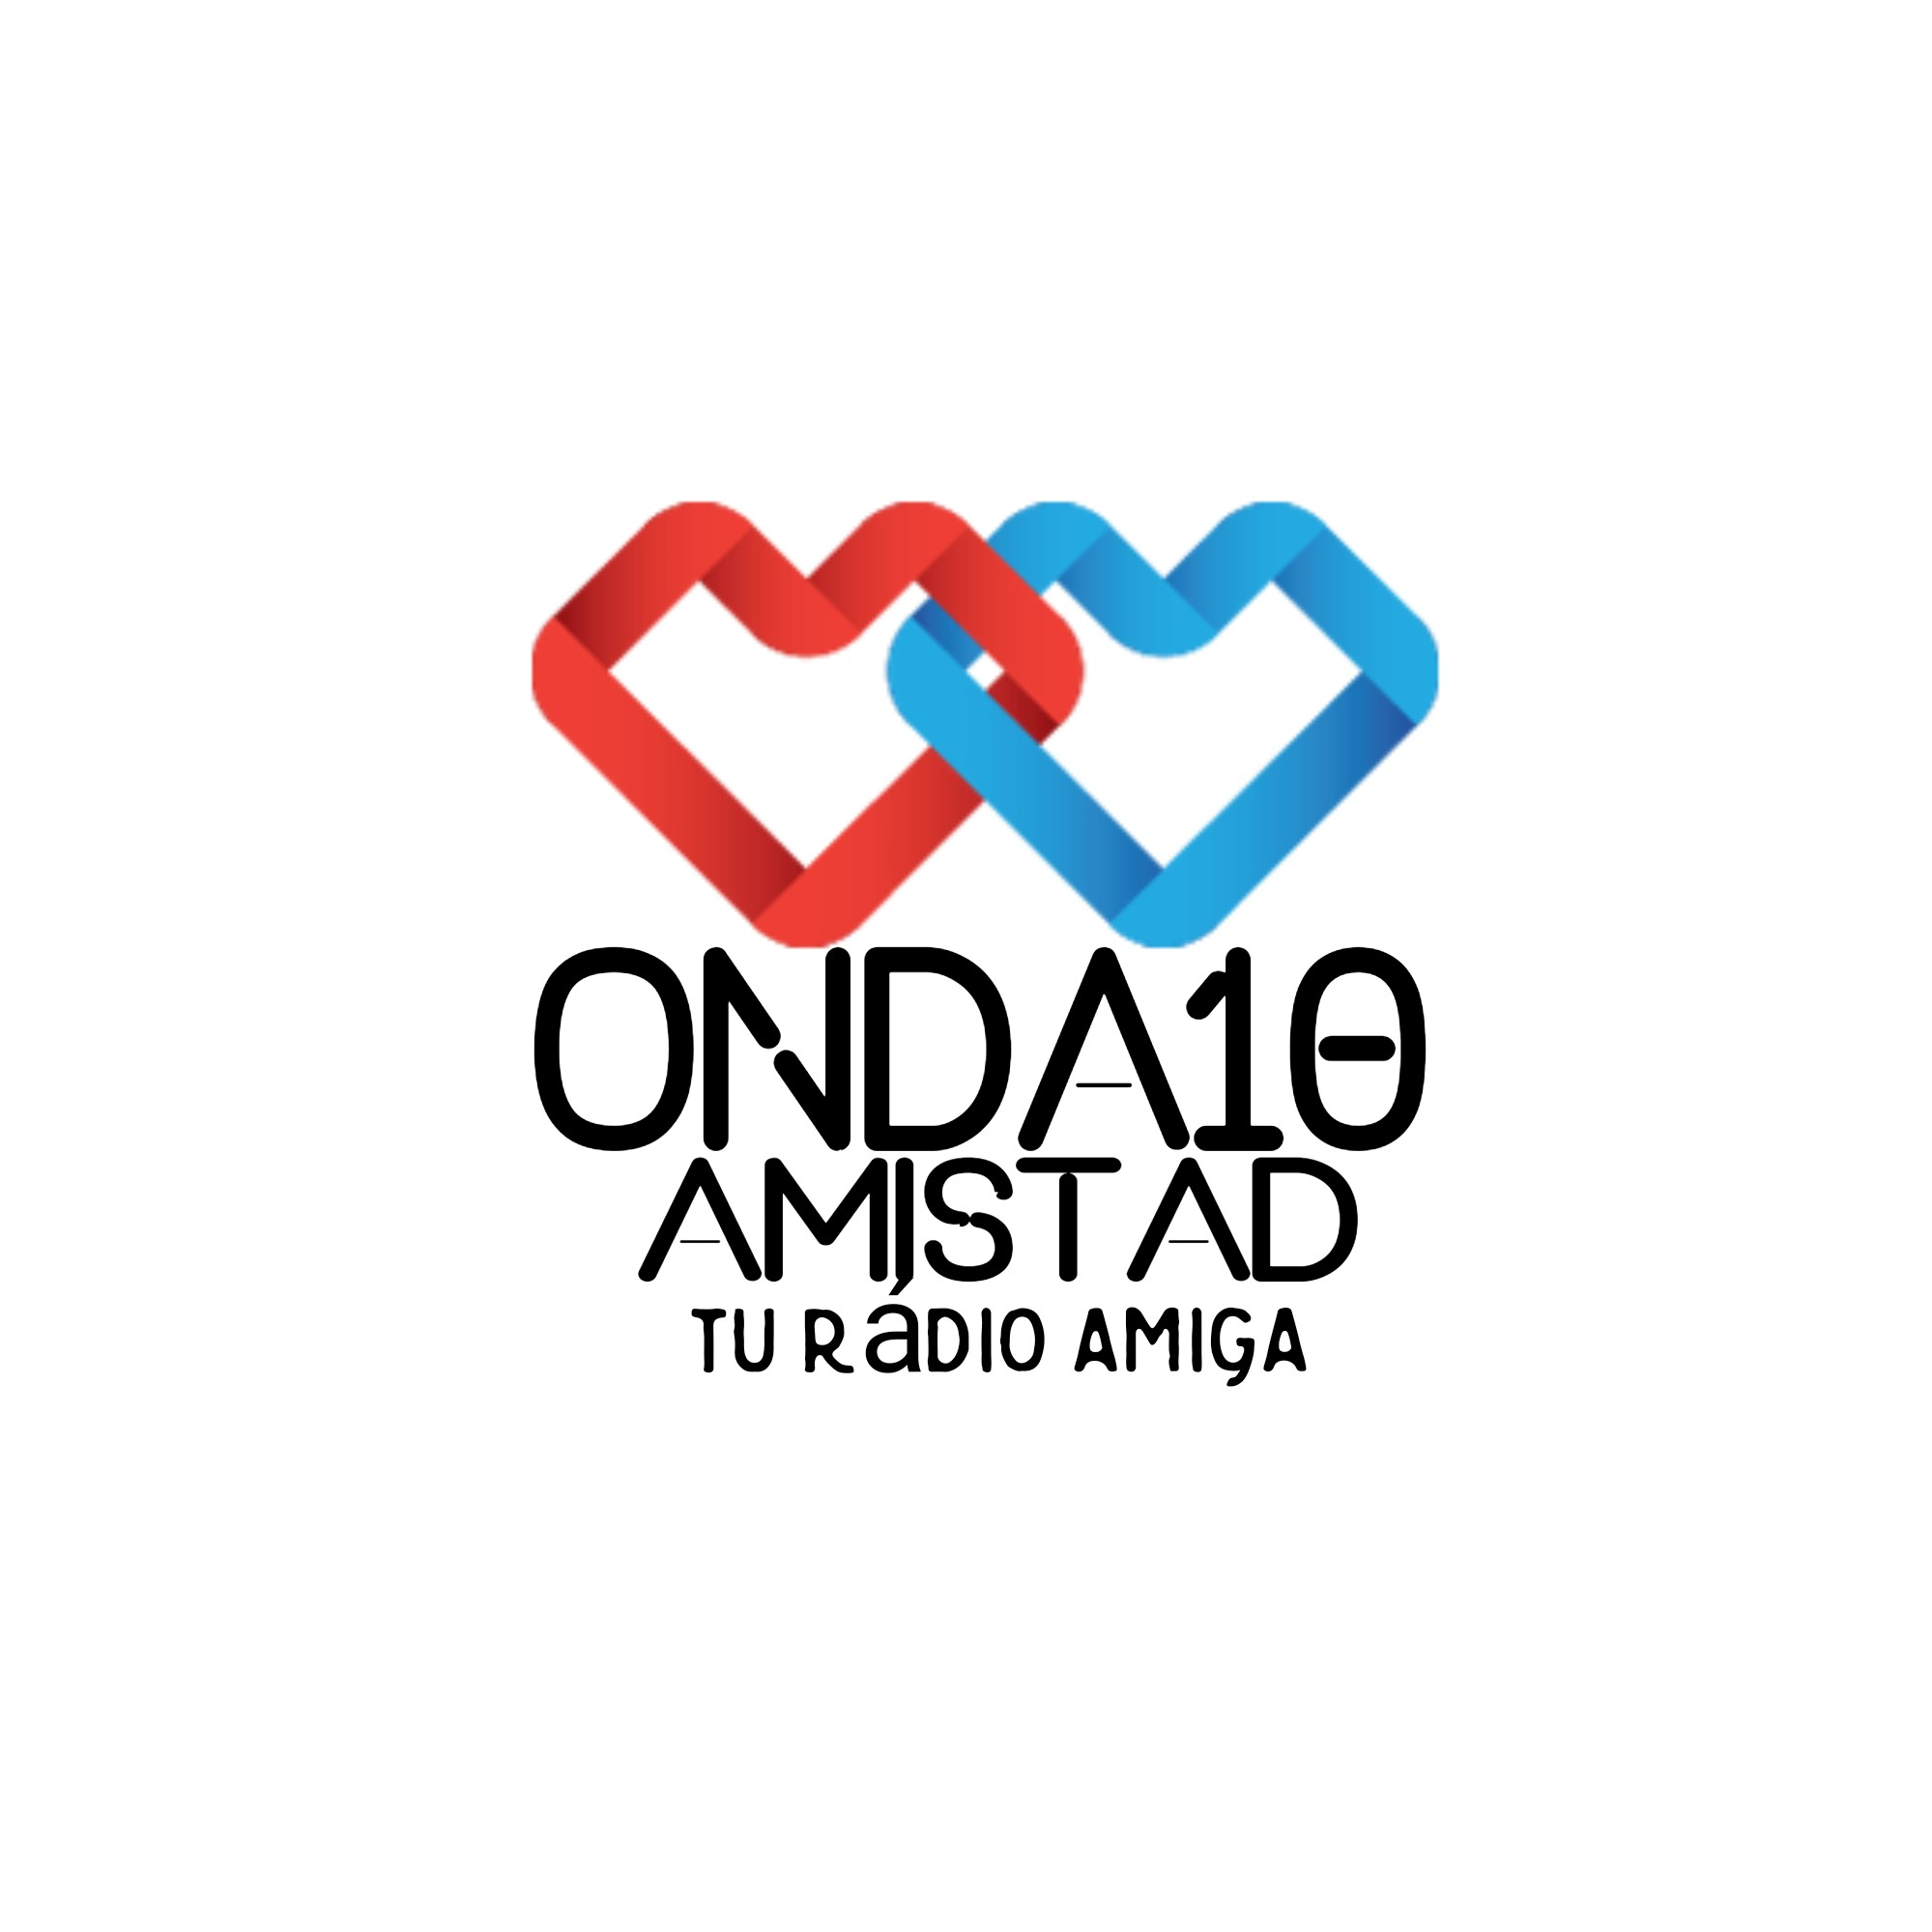 ONDA10 AMISTAD